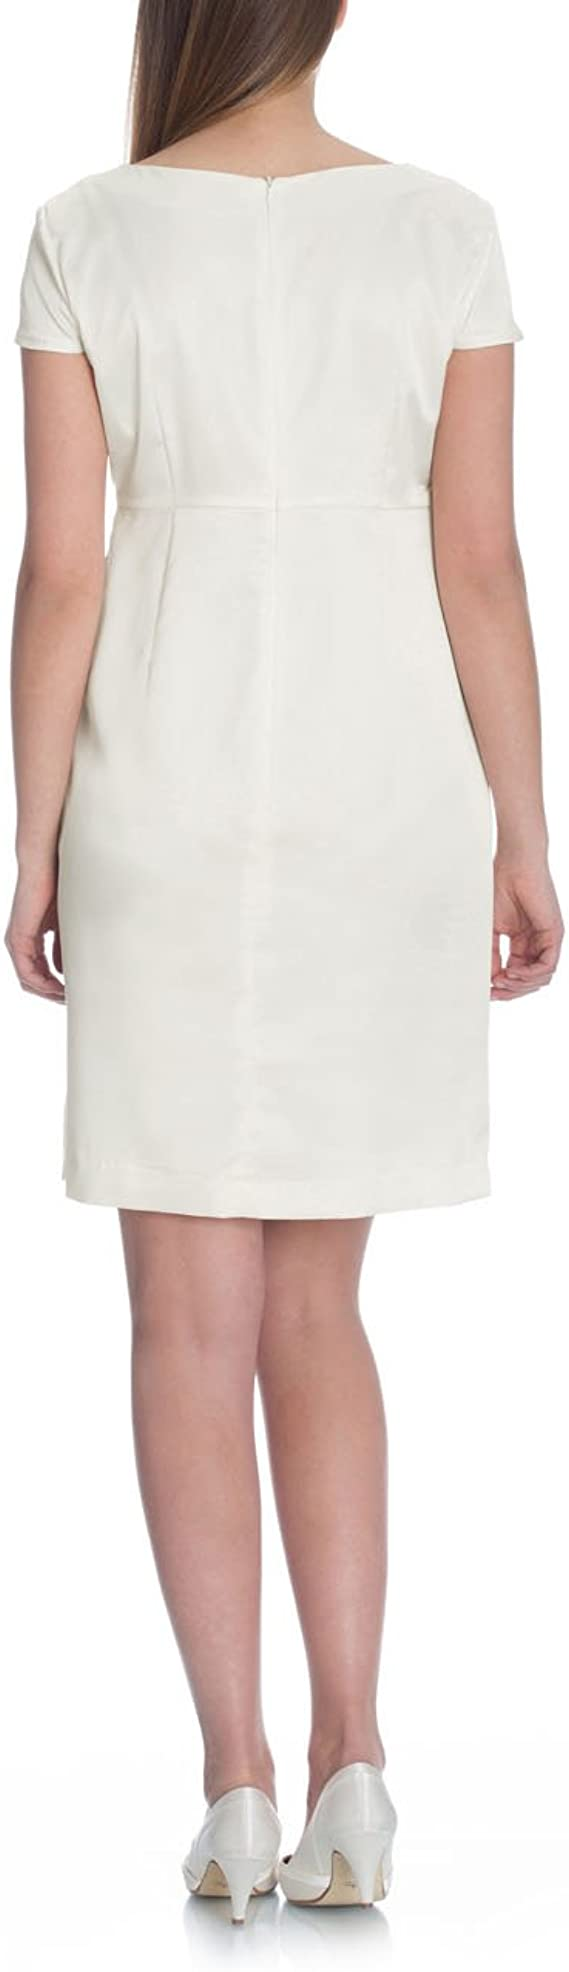 Bellybutton Damen Umstandsmode Kleid Regular Fit 11203-91100 Darja